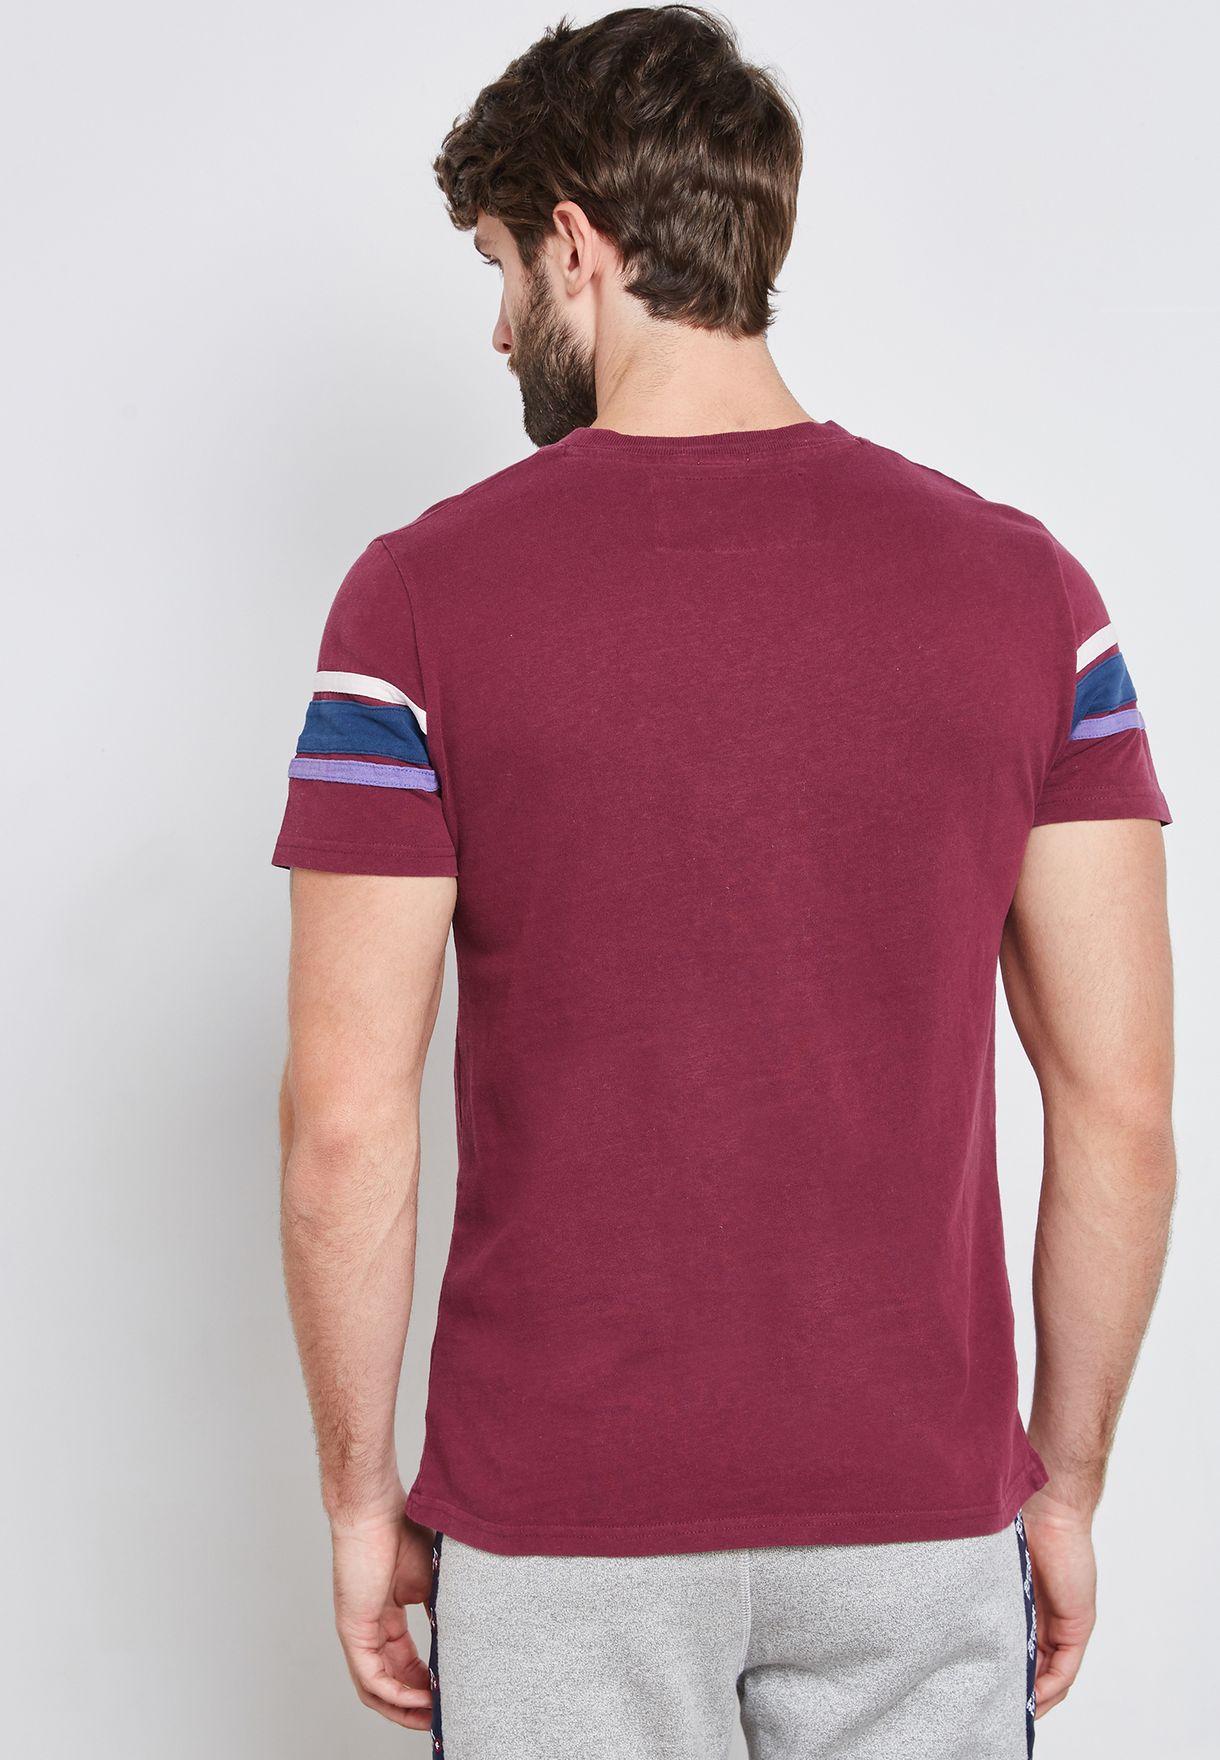 Pitch Field Retro T-Shirt